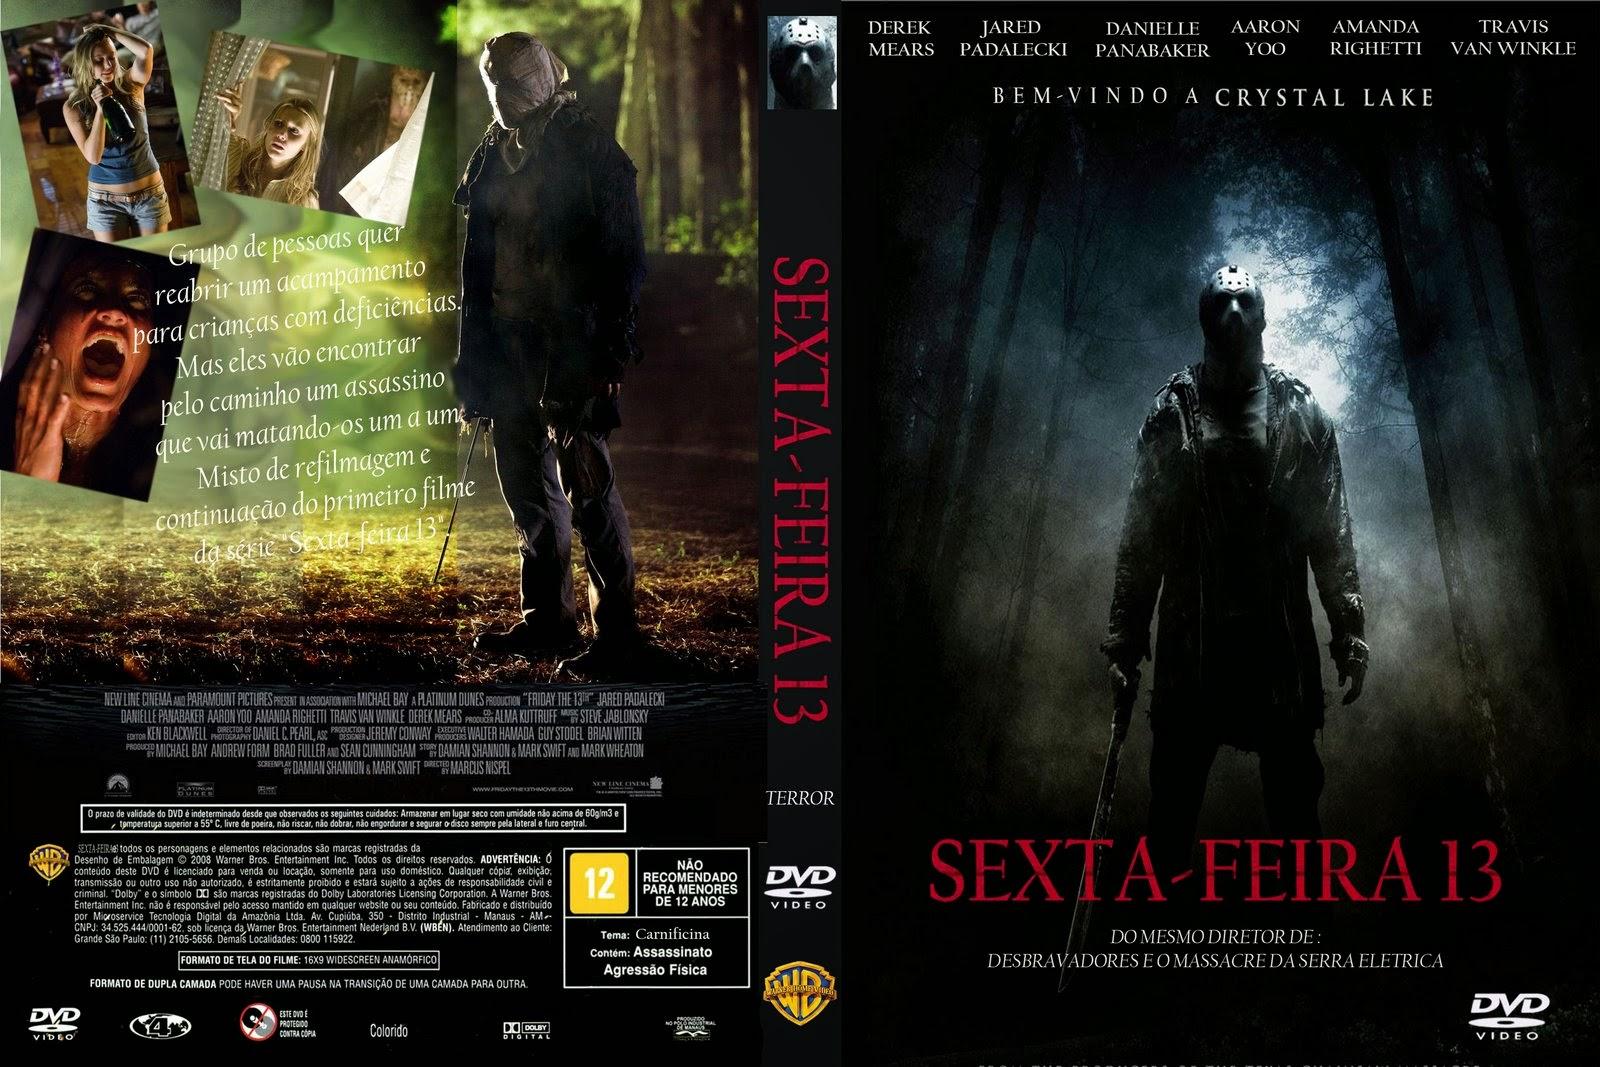 Sexta-Feira 13 2009 DVD Capa